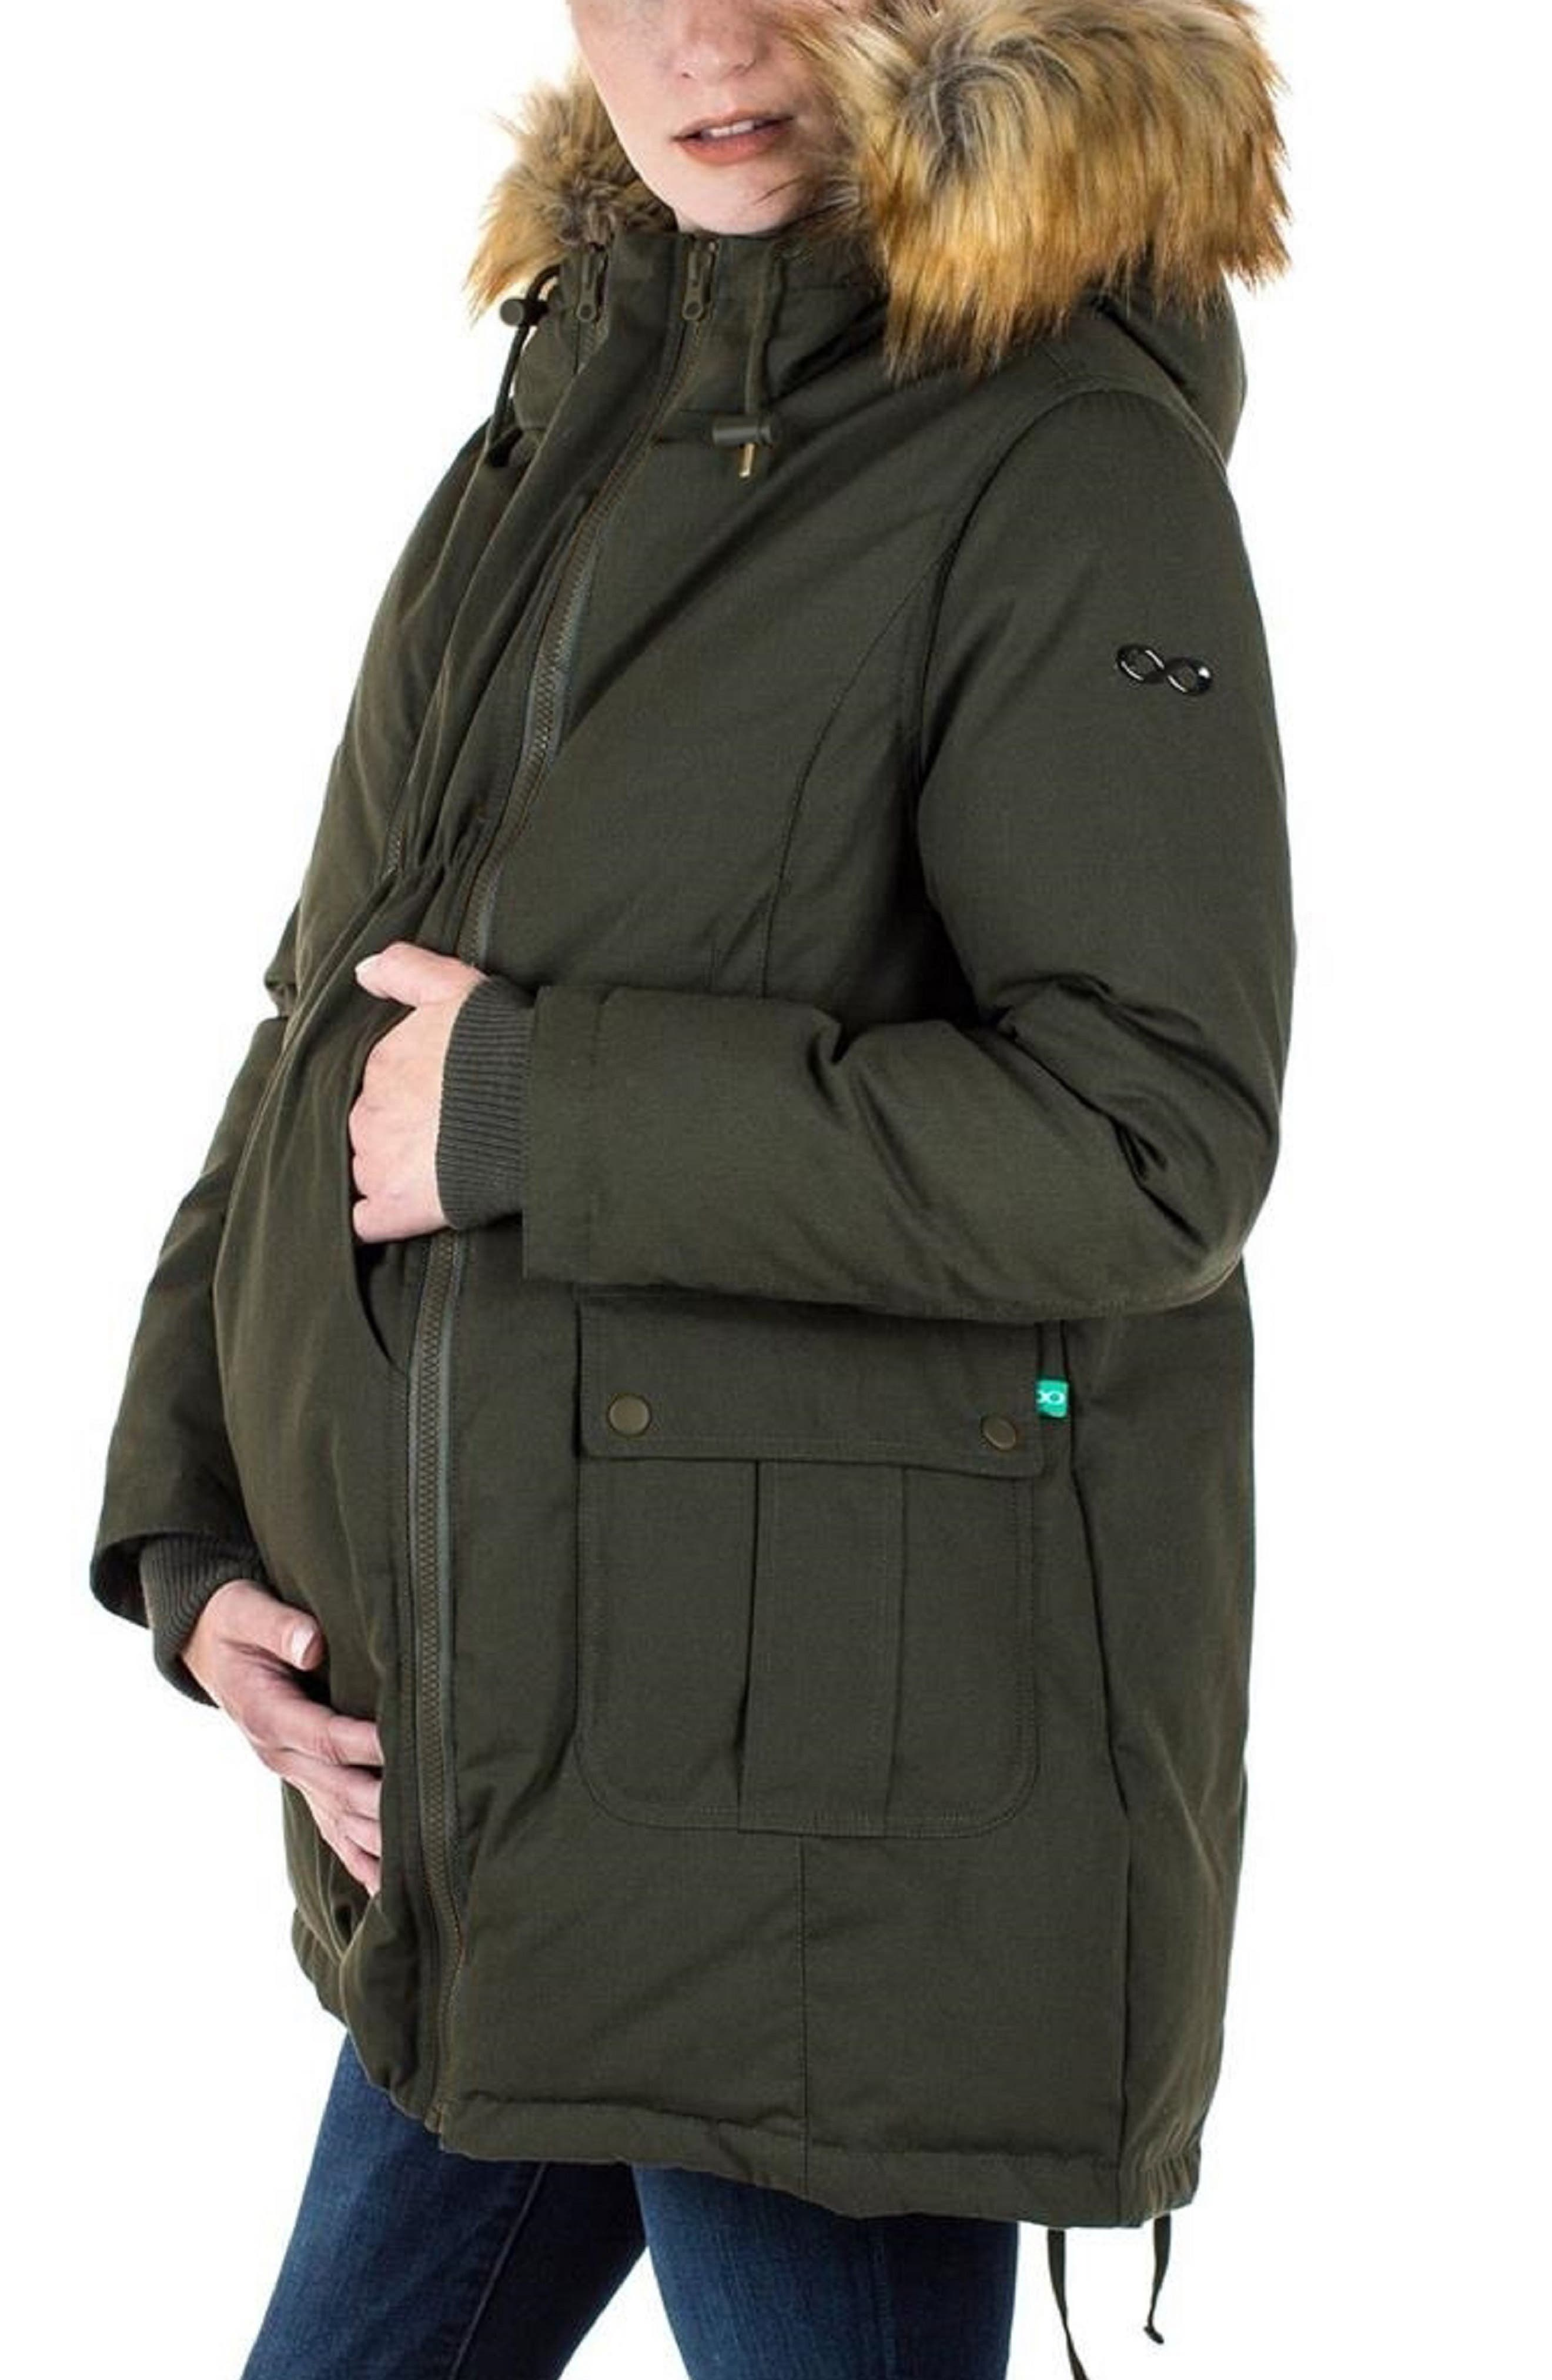 Convertible Down 3-in-1 Maternity Jacket,                             Alternate thumbnail 4, color,                             KHAKI GREEN